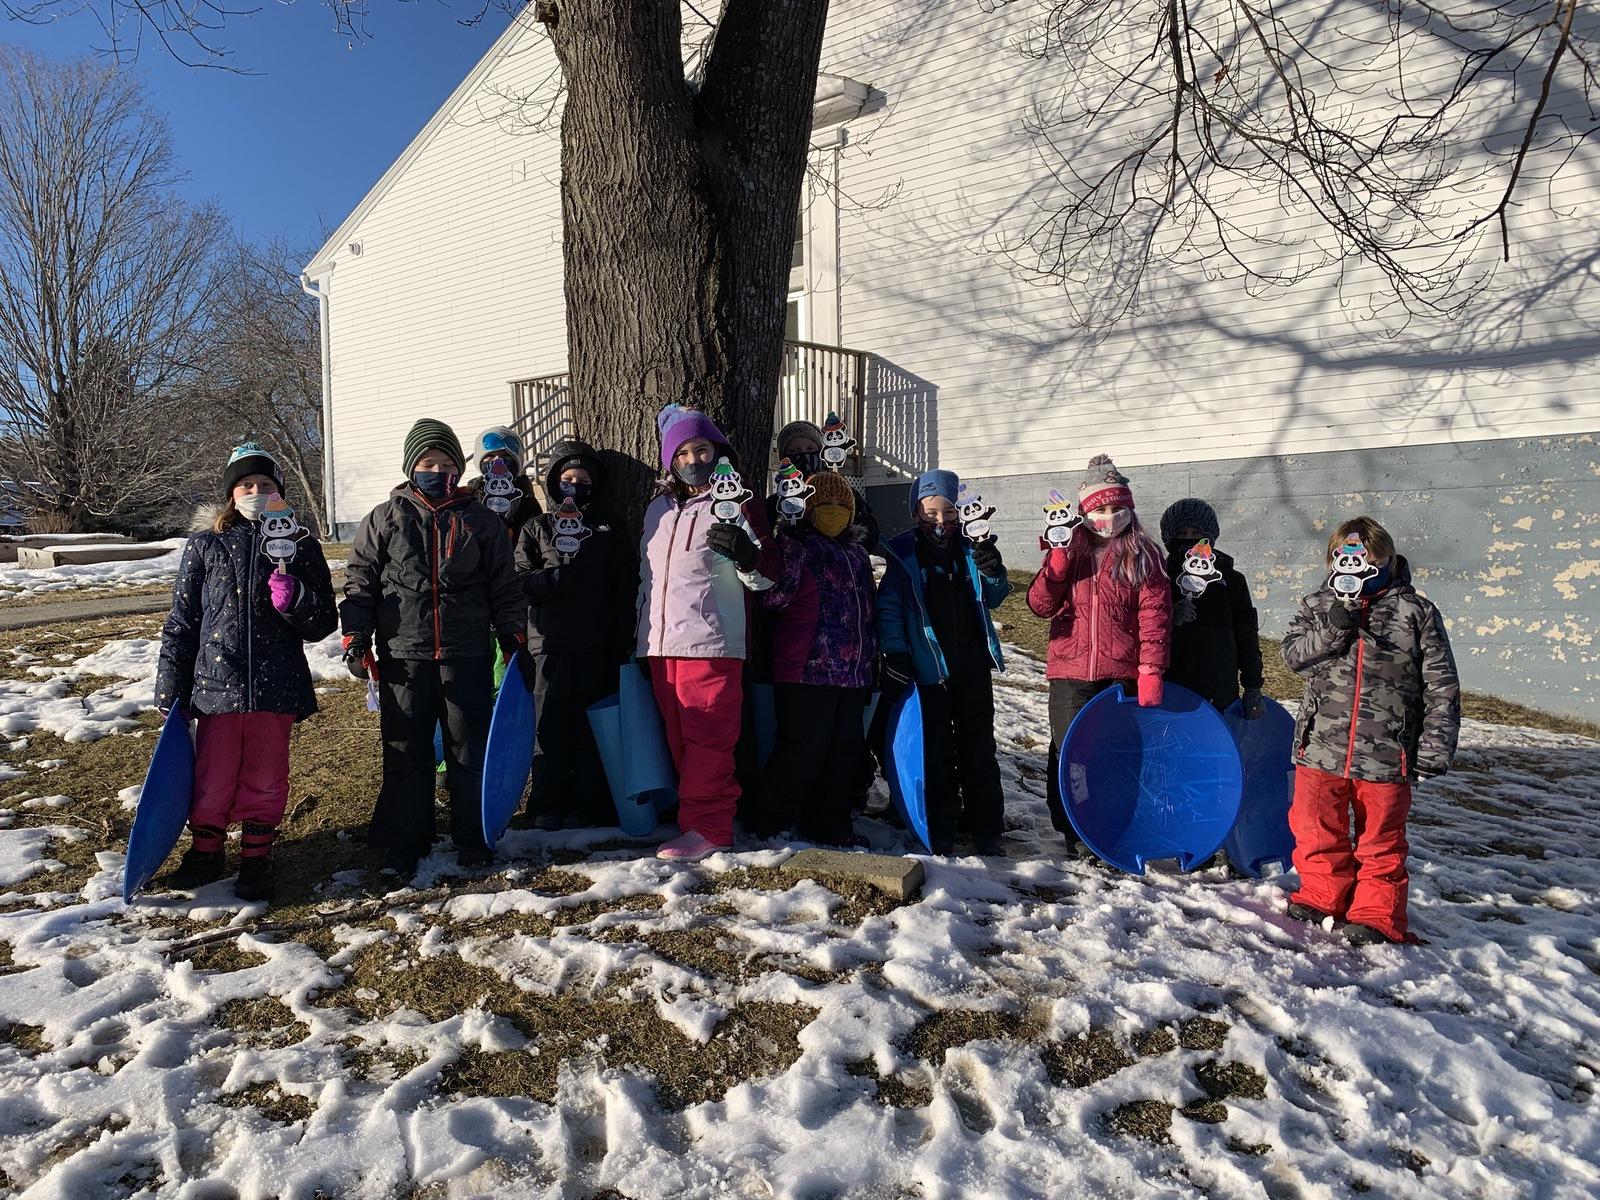 Week 1 2nd Grade Prescott Memorial 2 Winter Games 2021 Moment of the Week